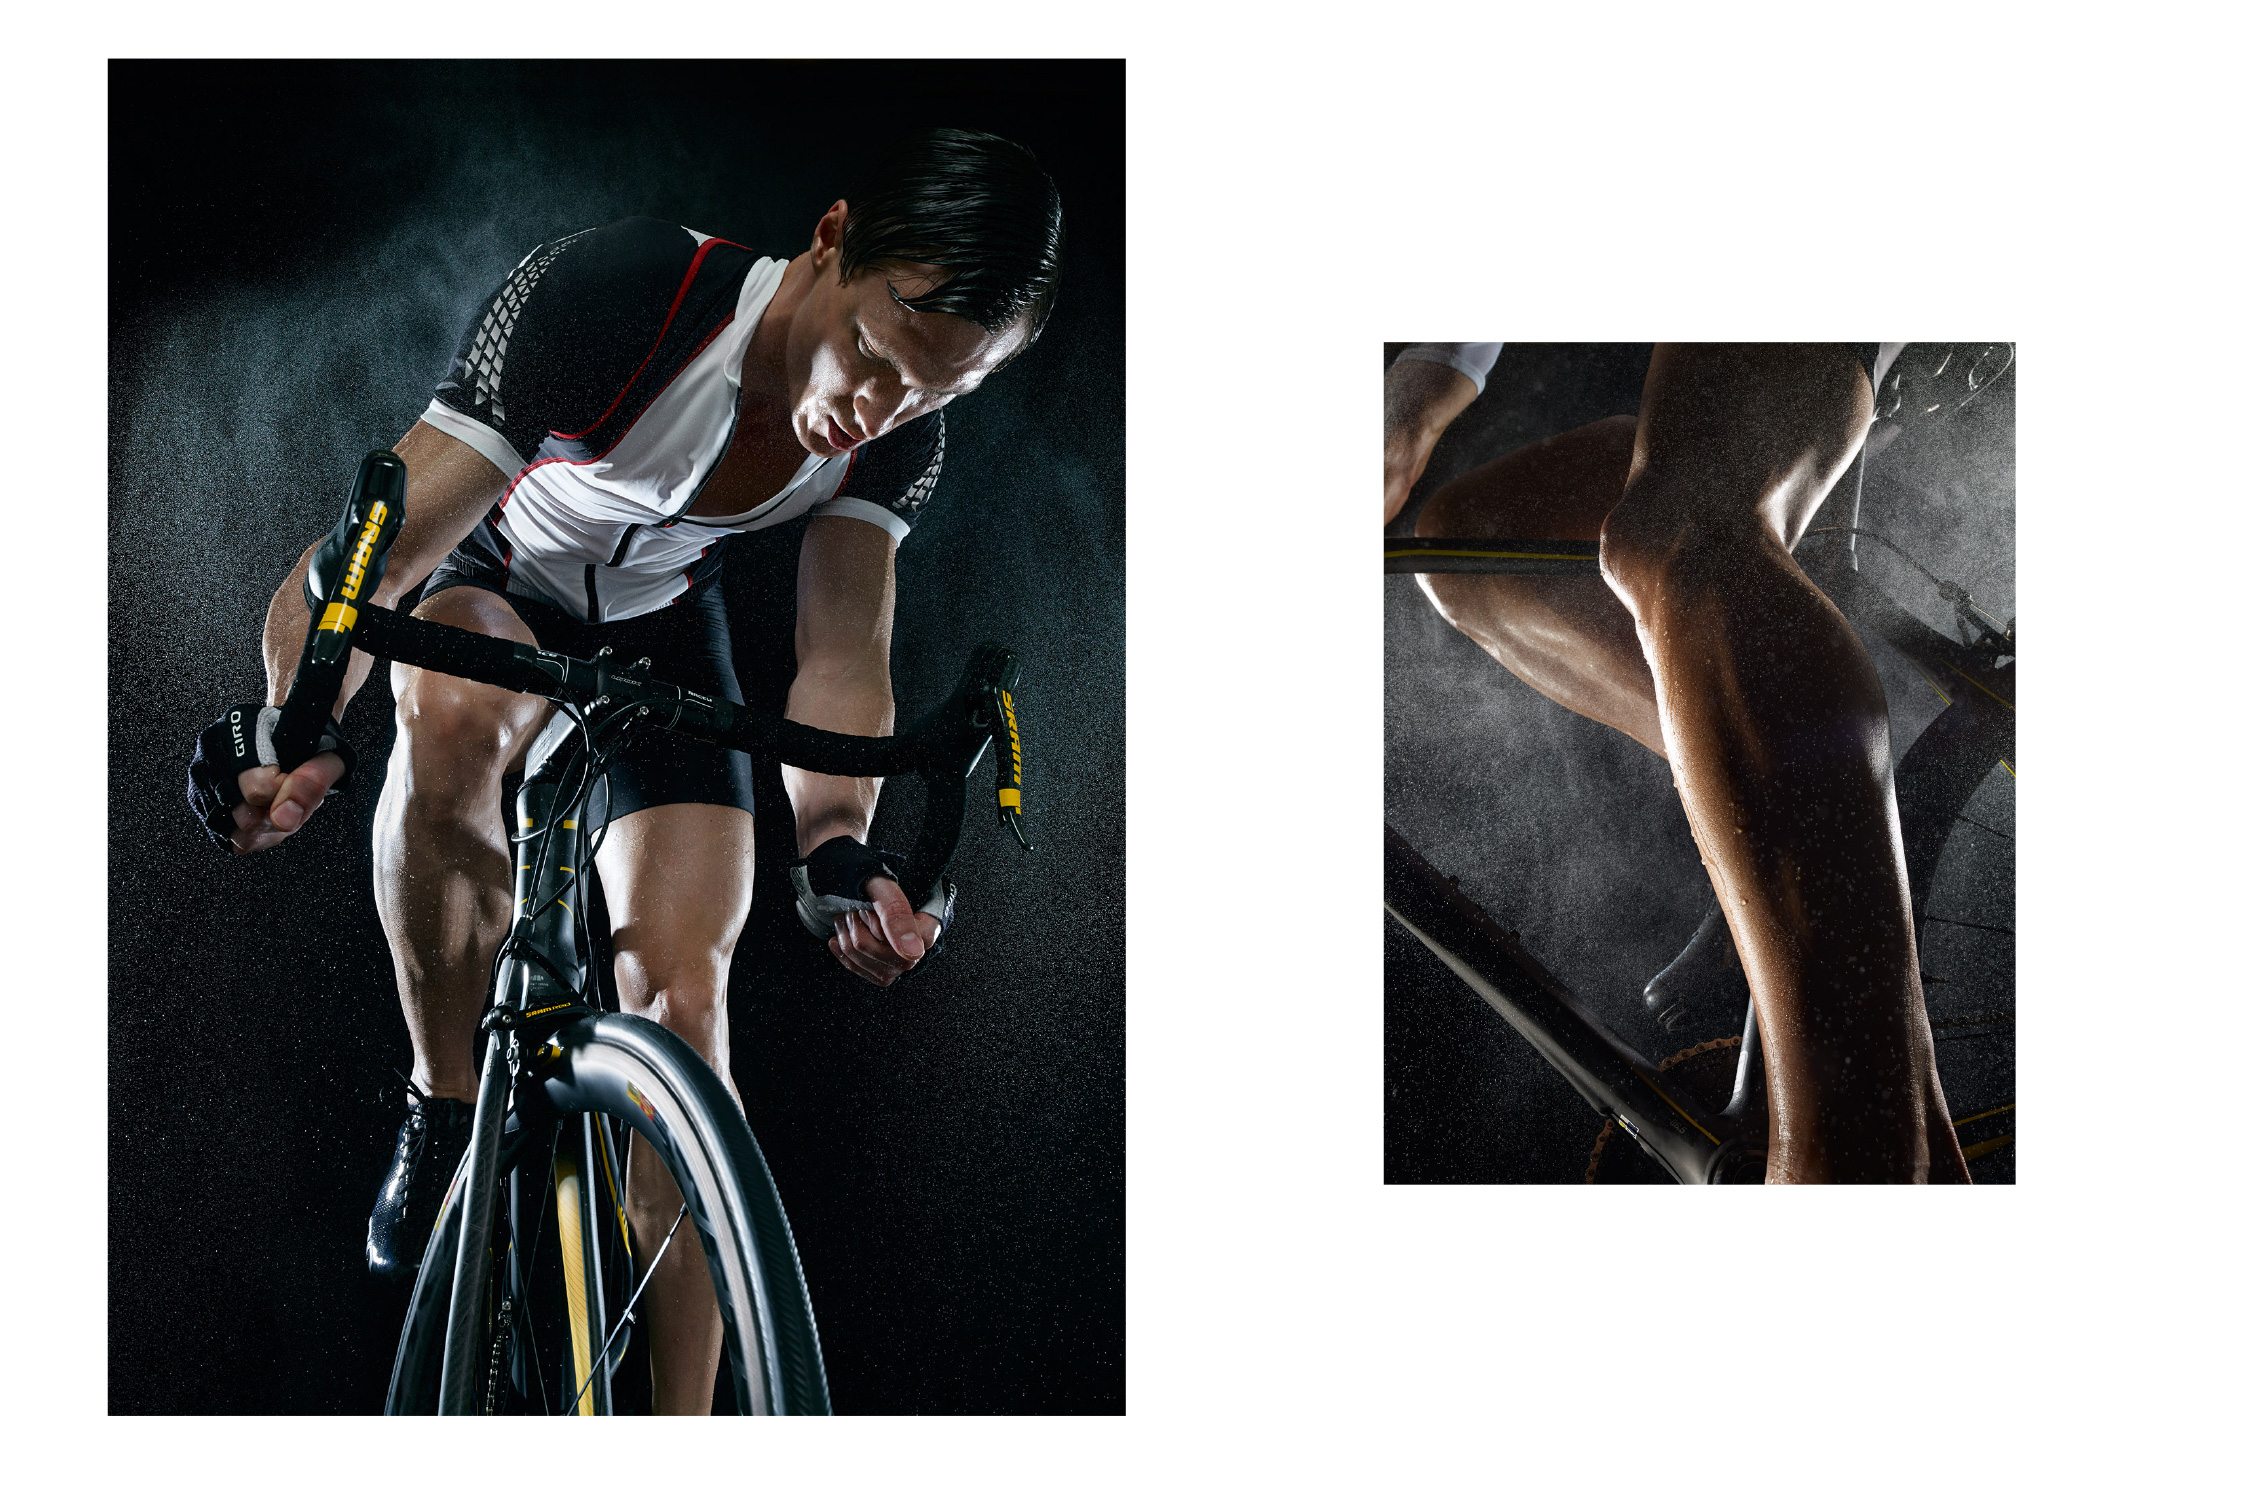 92-Cyclist-.jpg